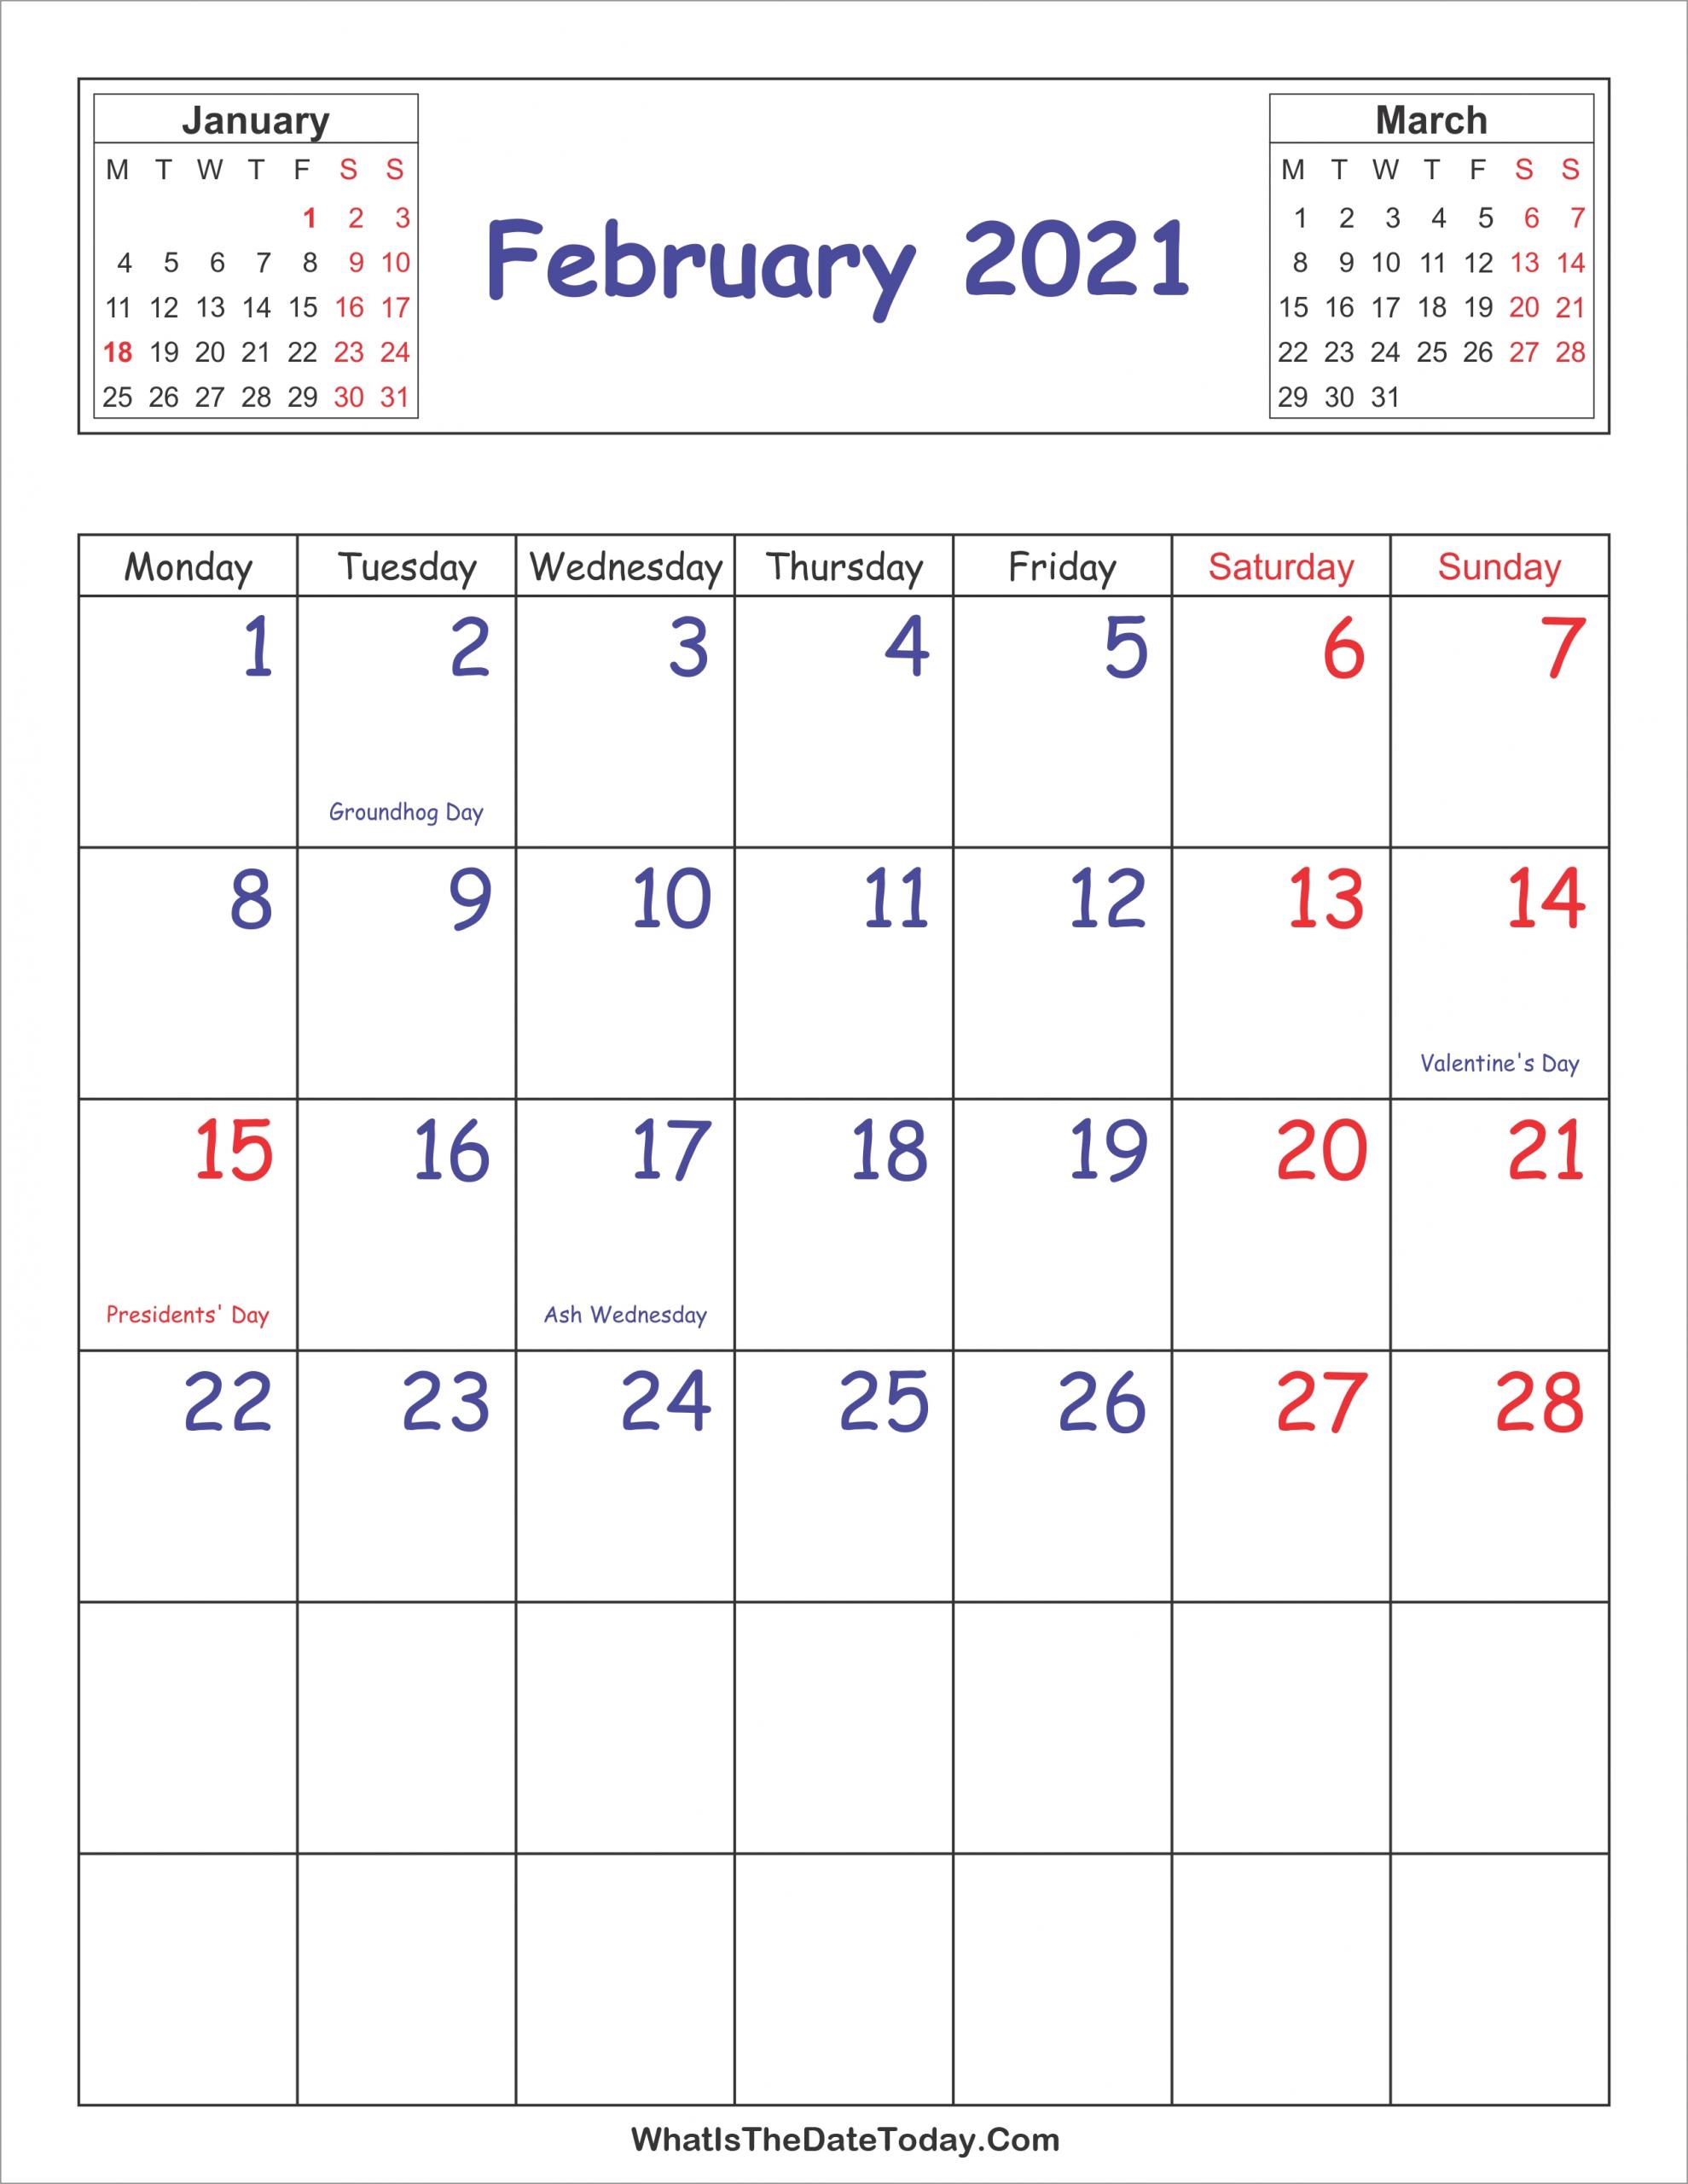 Printable 2021 Calendar February (Vertical Layout